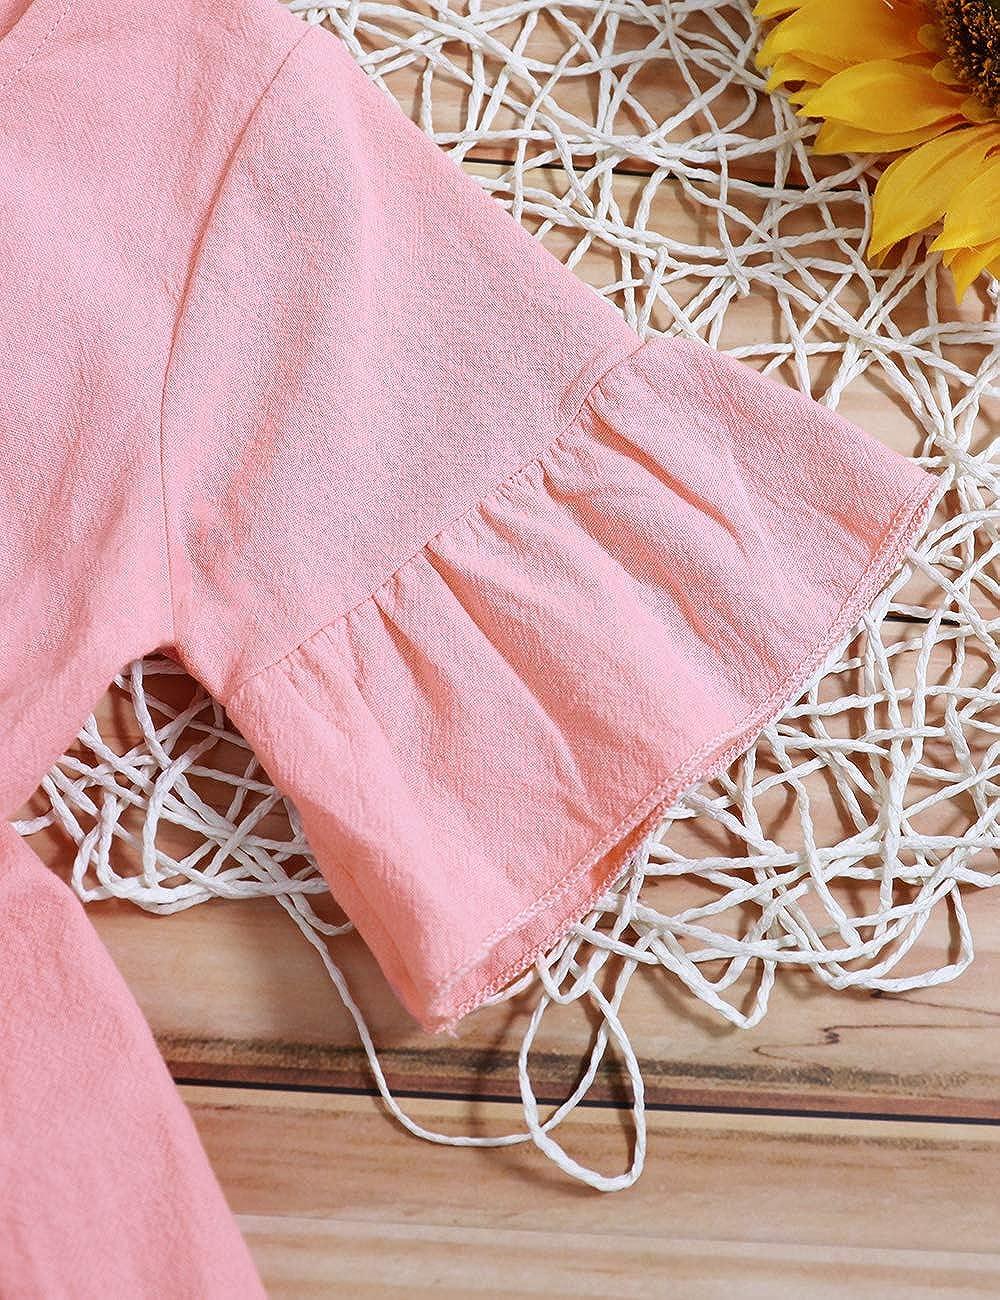 Little Kids Girl Clothes Summer Short Sets Cotton Casual Coat Jeans 2 Pcs Pants Toddler Outfit Sets